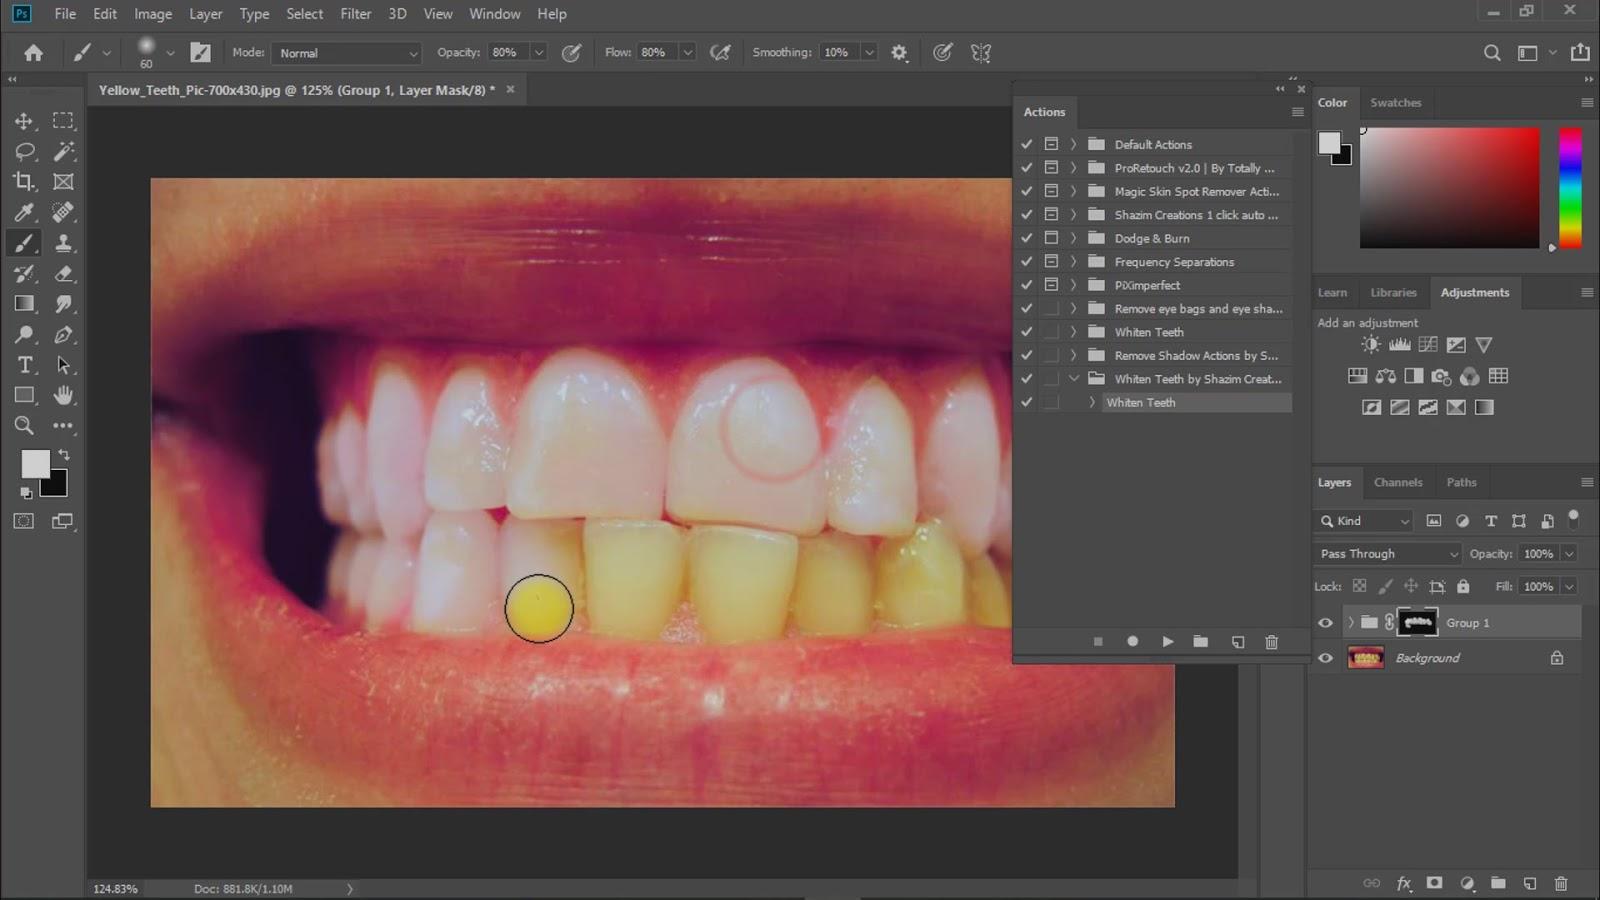 brighten and whiten teeth in photoshop actions screenshot 6